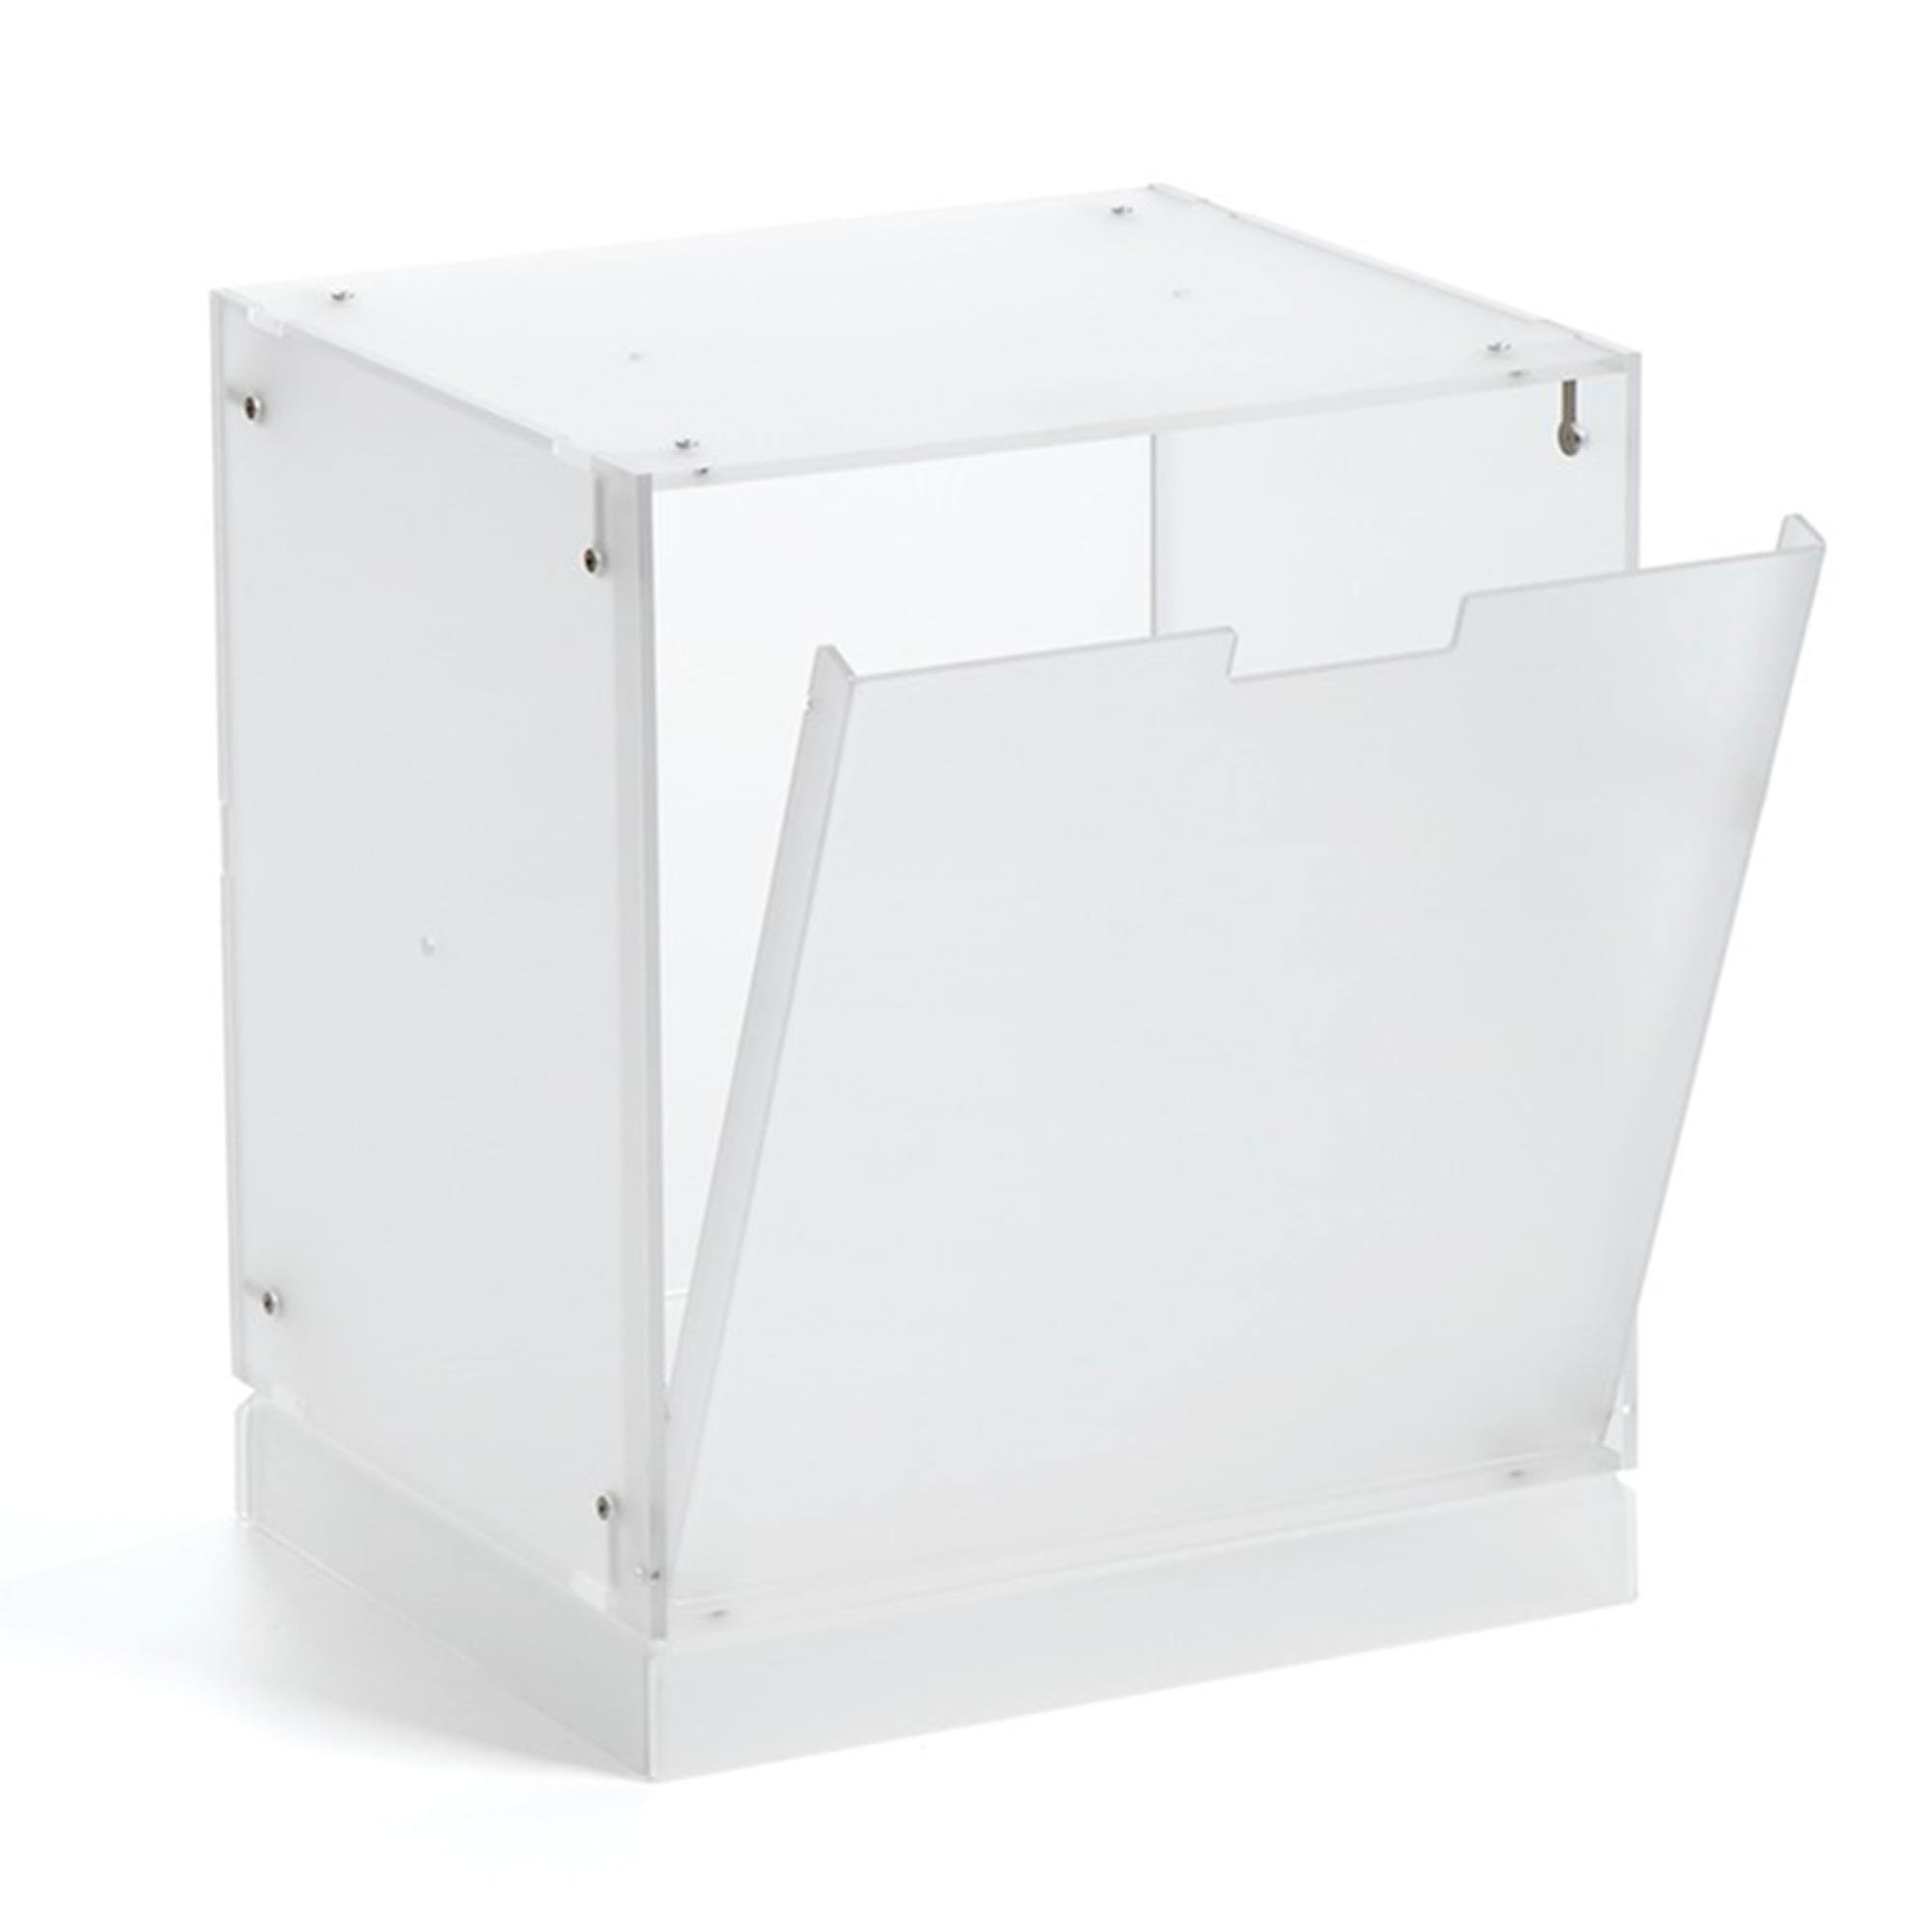 cubo vintage con anta cm in metacrilato bianco satinato emporium stilcasa net. Black Bedroom Furniture Sets. Home Design Ideas